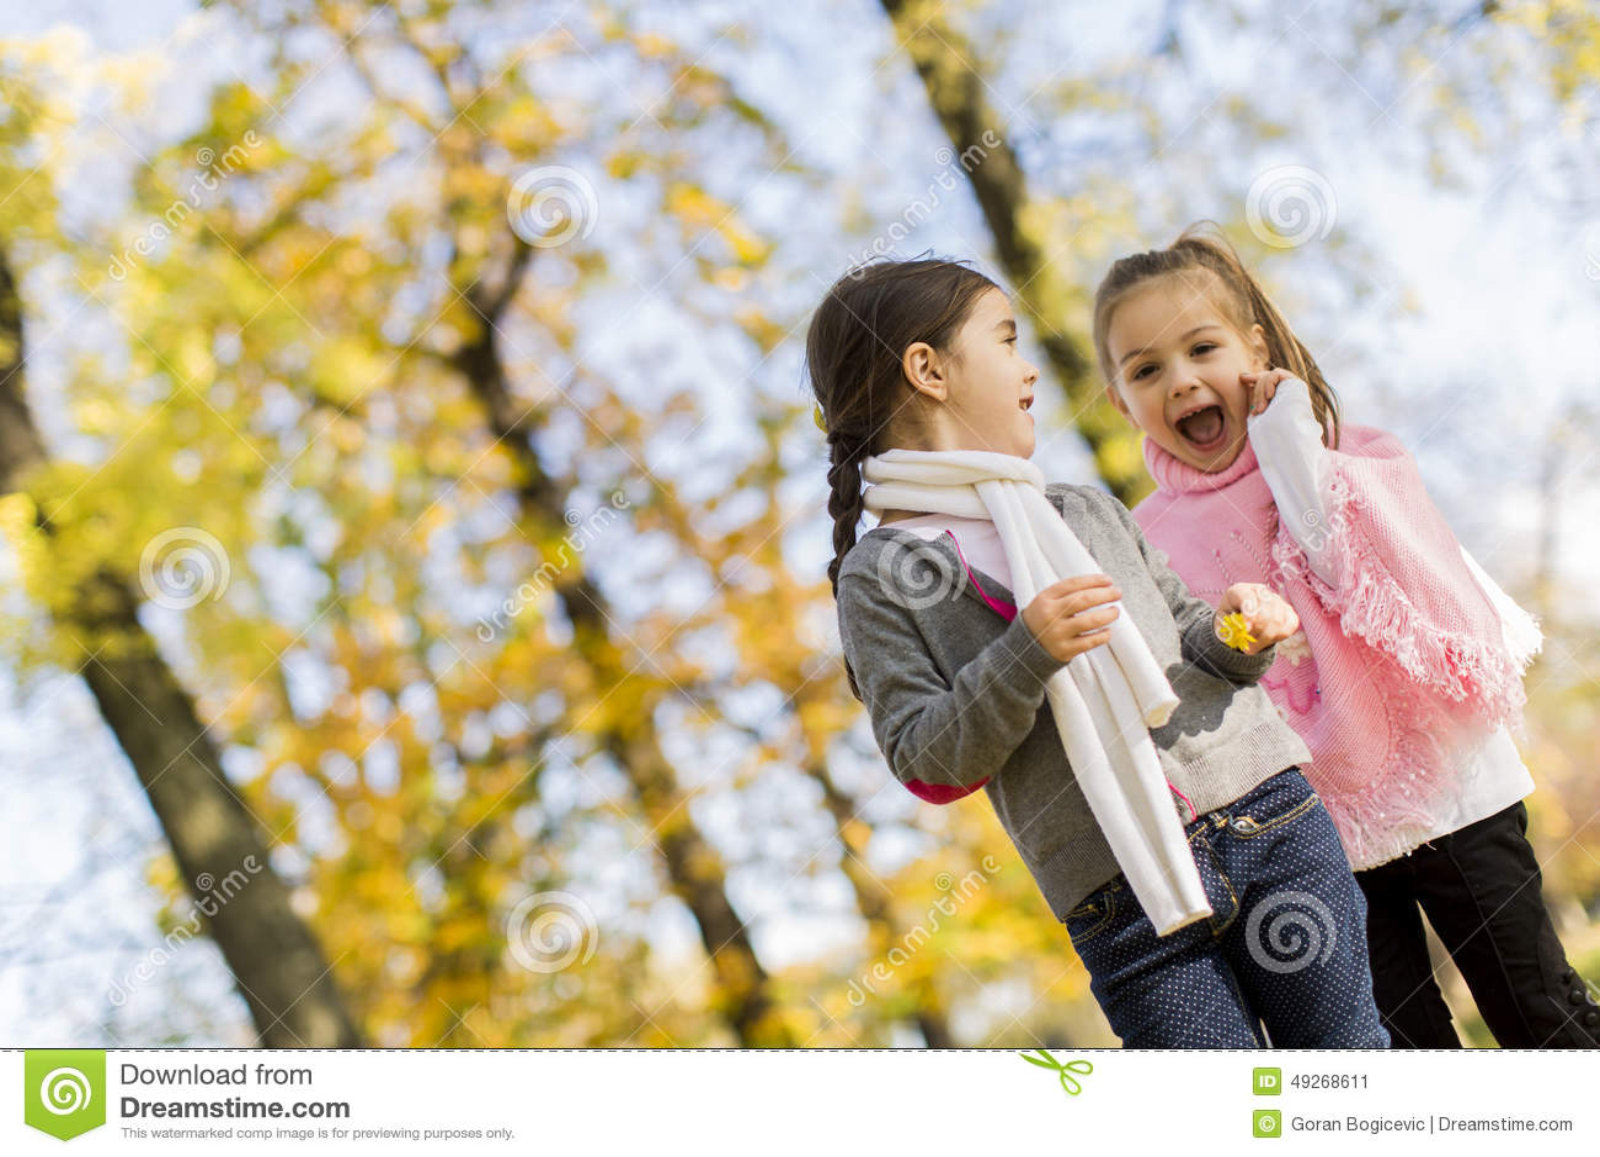 Little girls in the autumn park